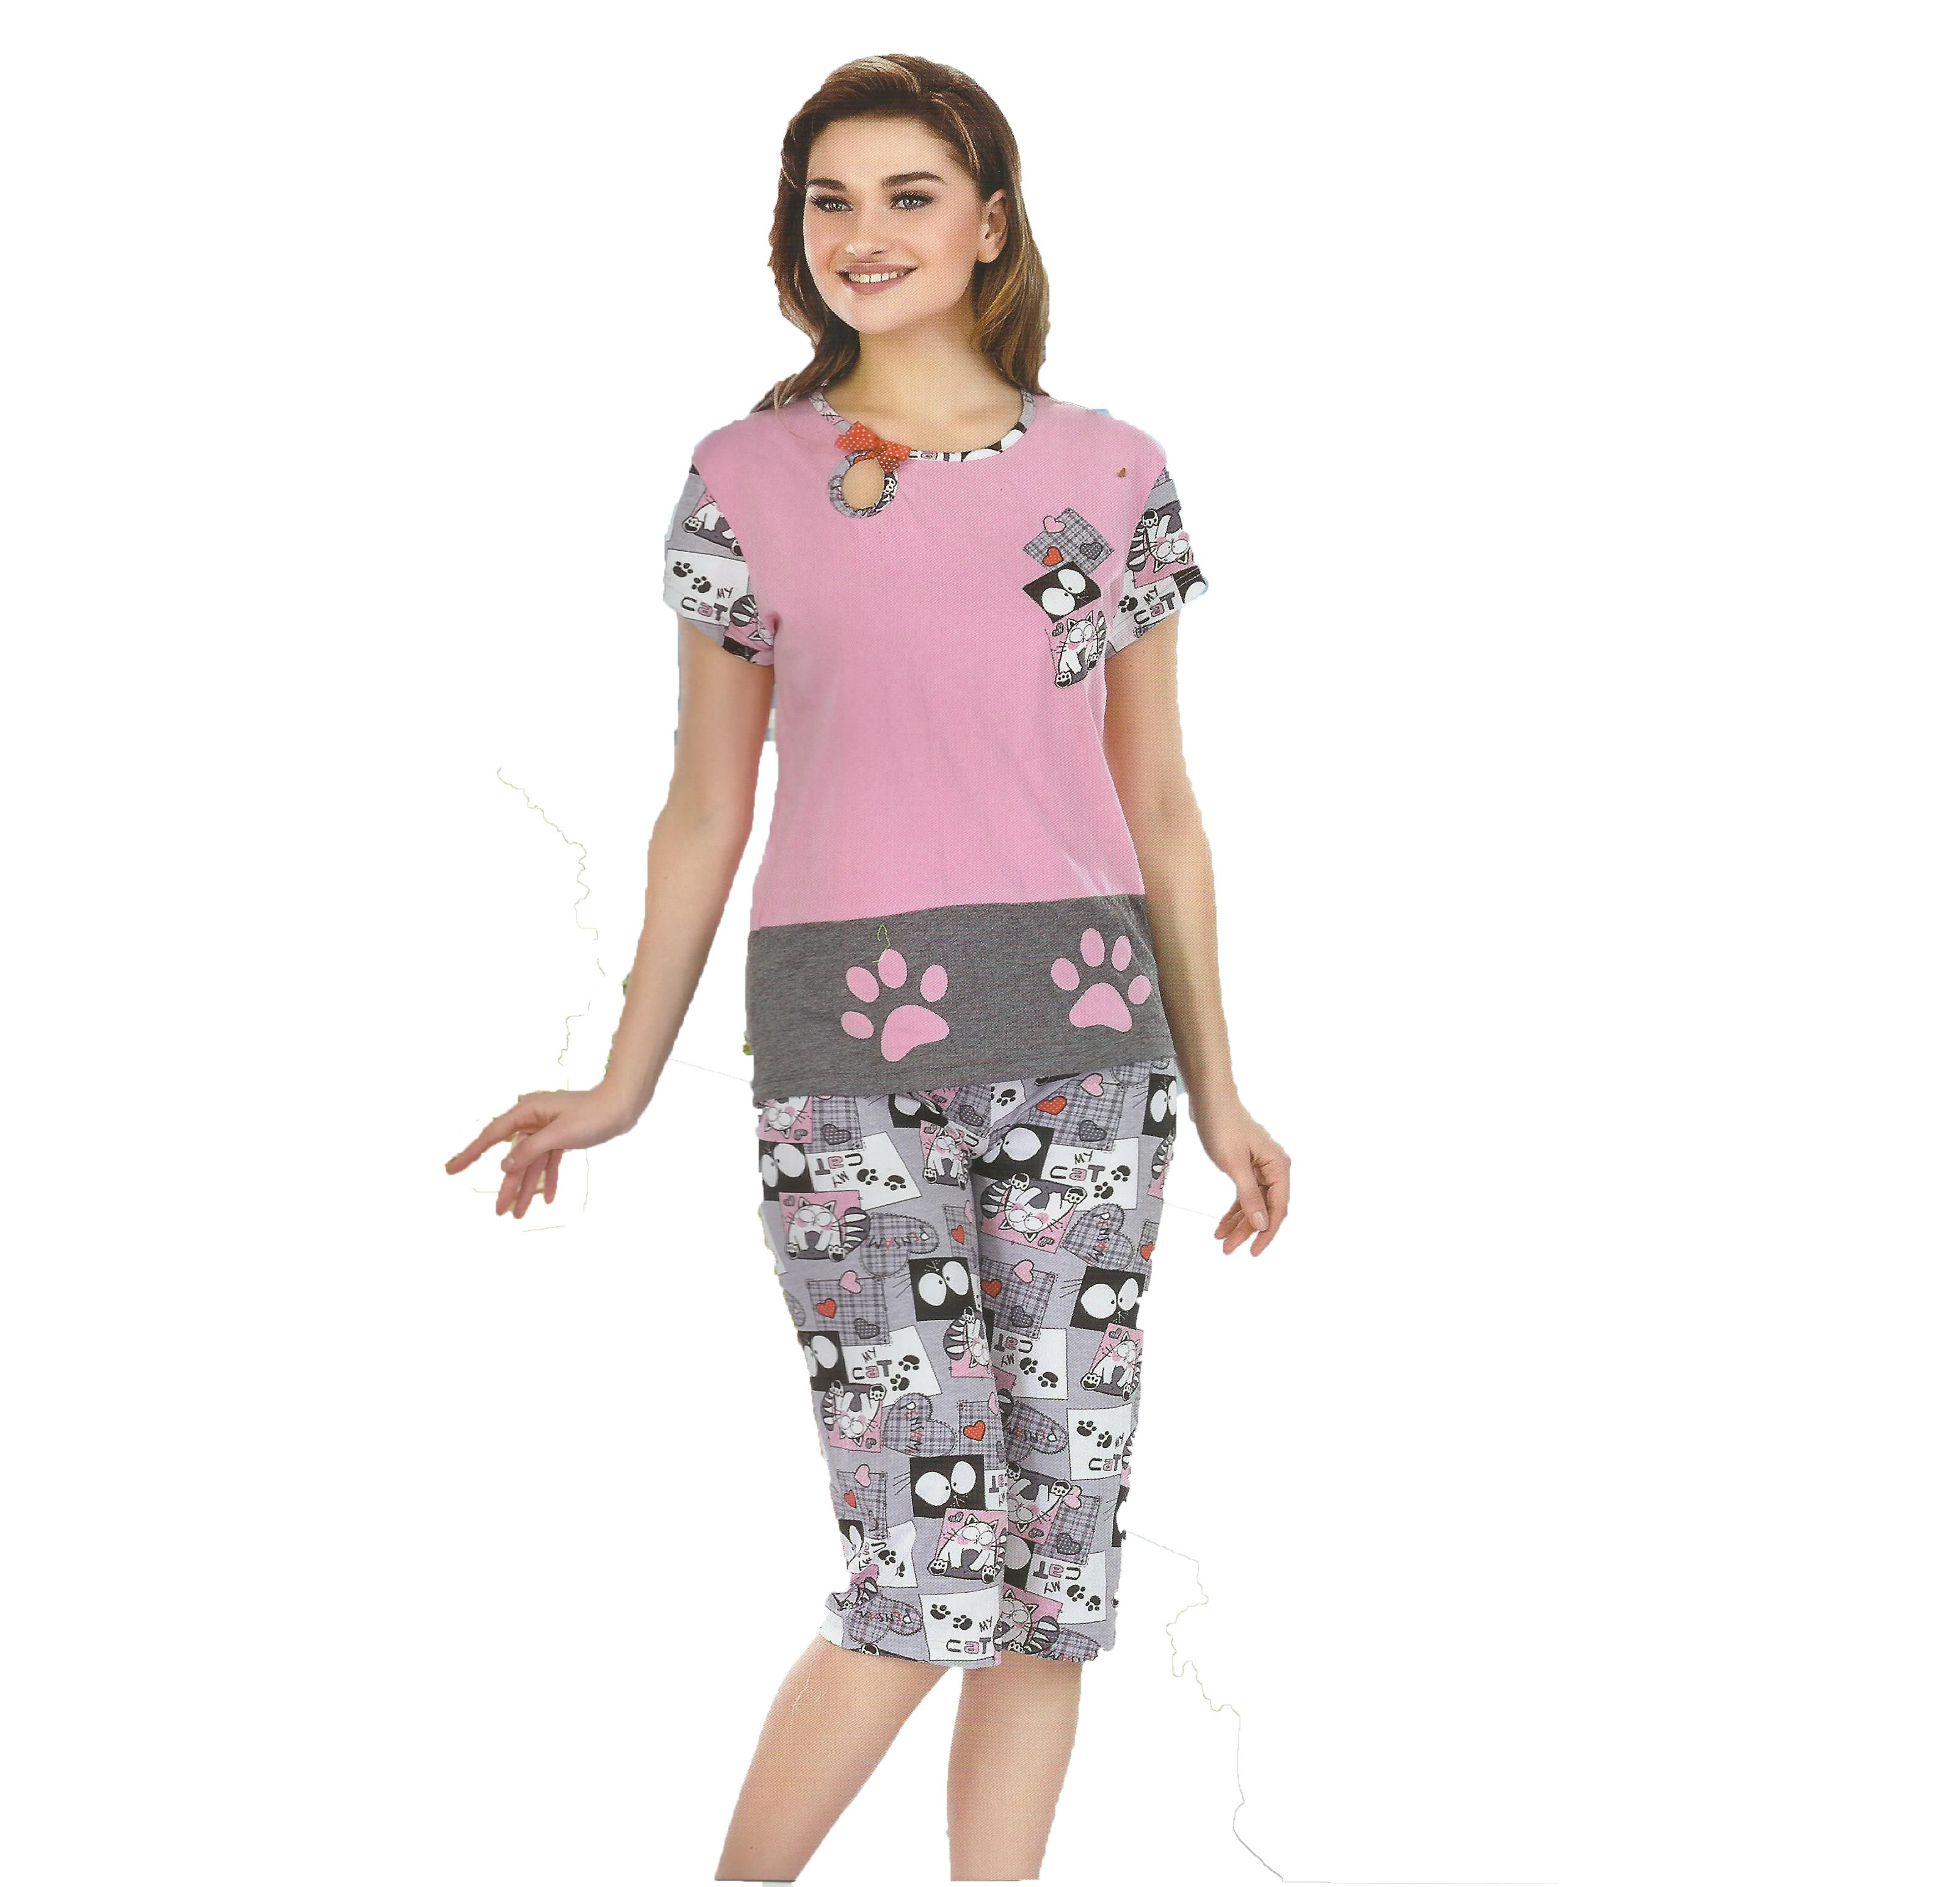 Ucuz Bayan Giyim Online Alisveris Tozlu Giyim Kapida Odeme Bayan Giyim Siteleri Kapida Odeme Bayan Giyim Siteleri Ucuz Deppo Avantaj Kadin Giyim Moda Giyim